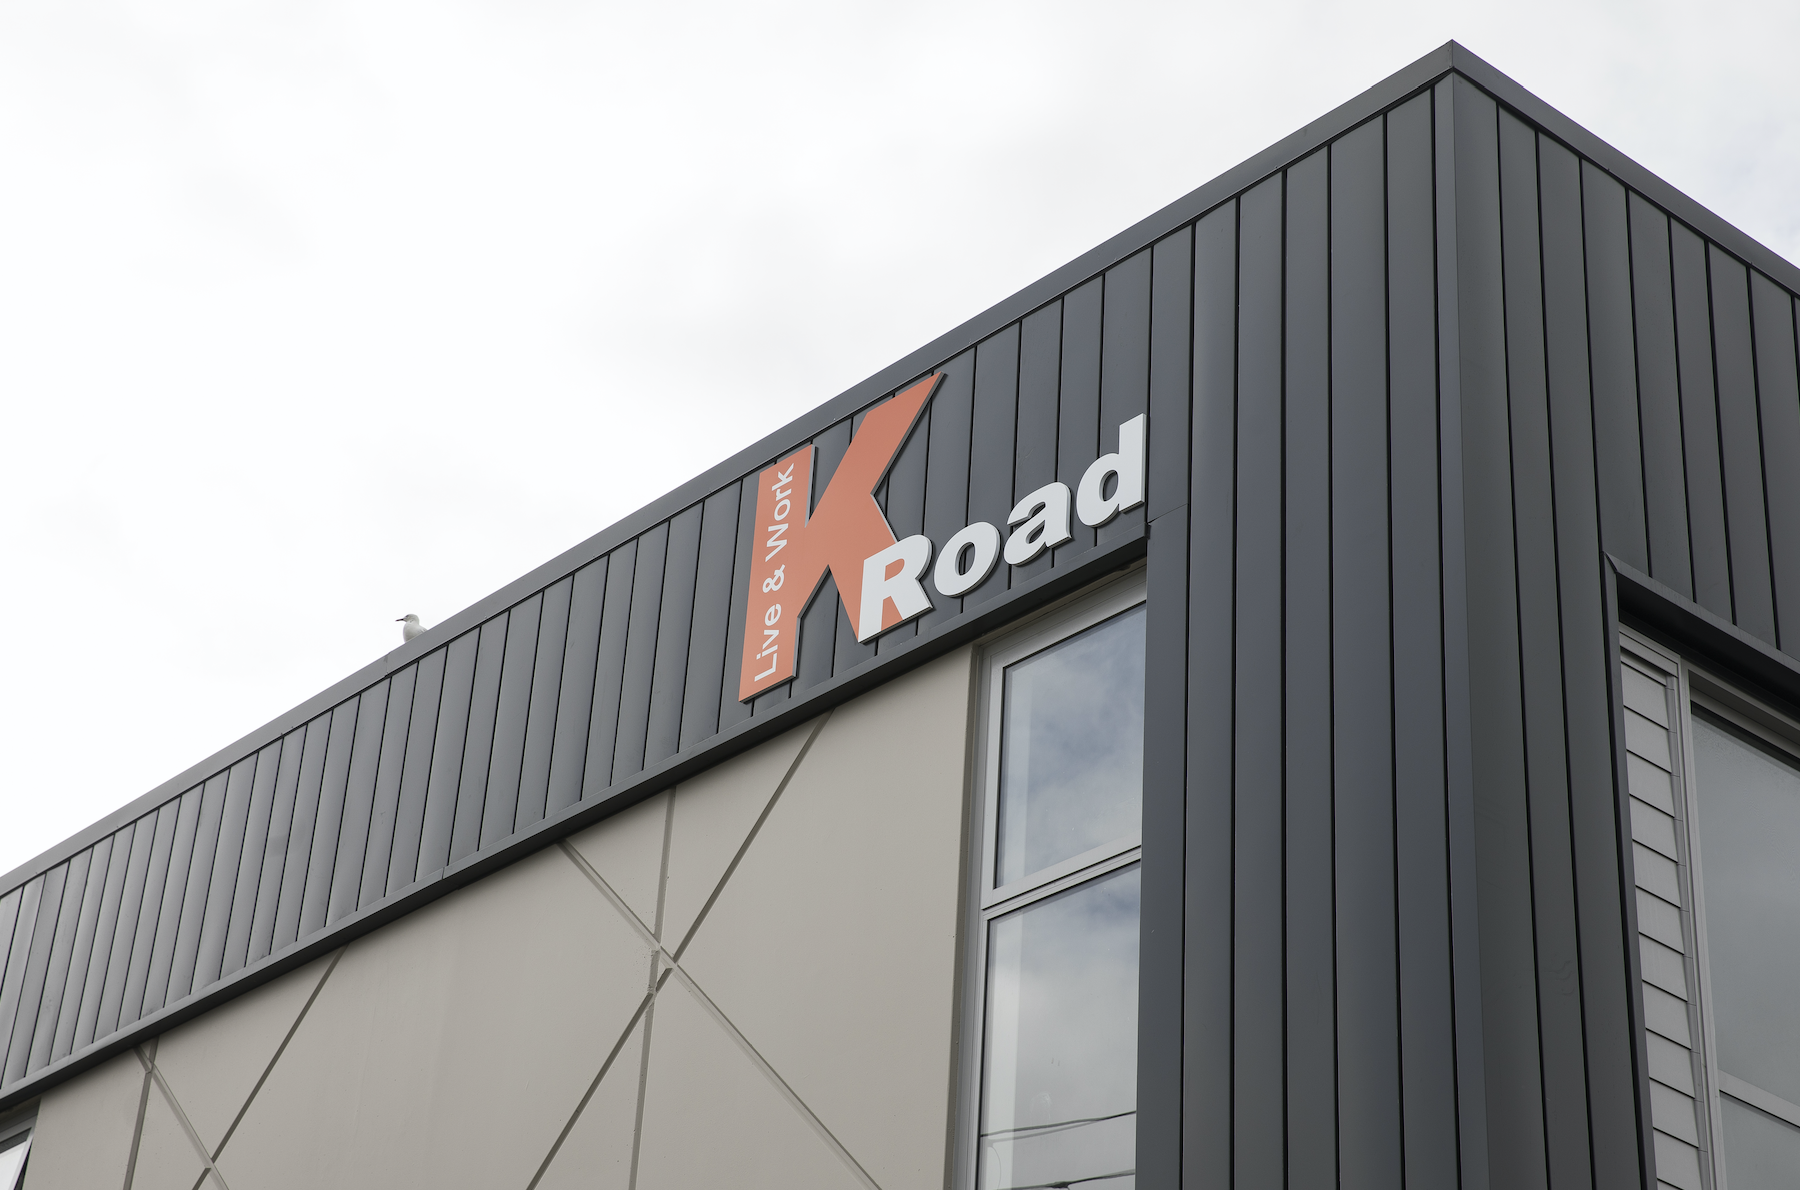 The-Roofing-Store-Steel-Metal-Interlocking-Panel-Windsor-grey-11-LR.png